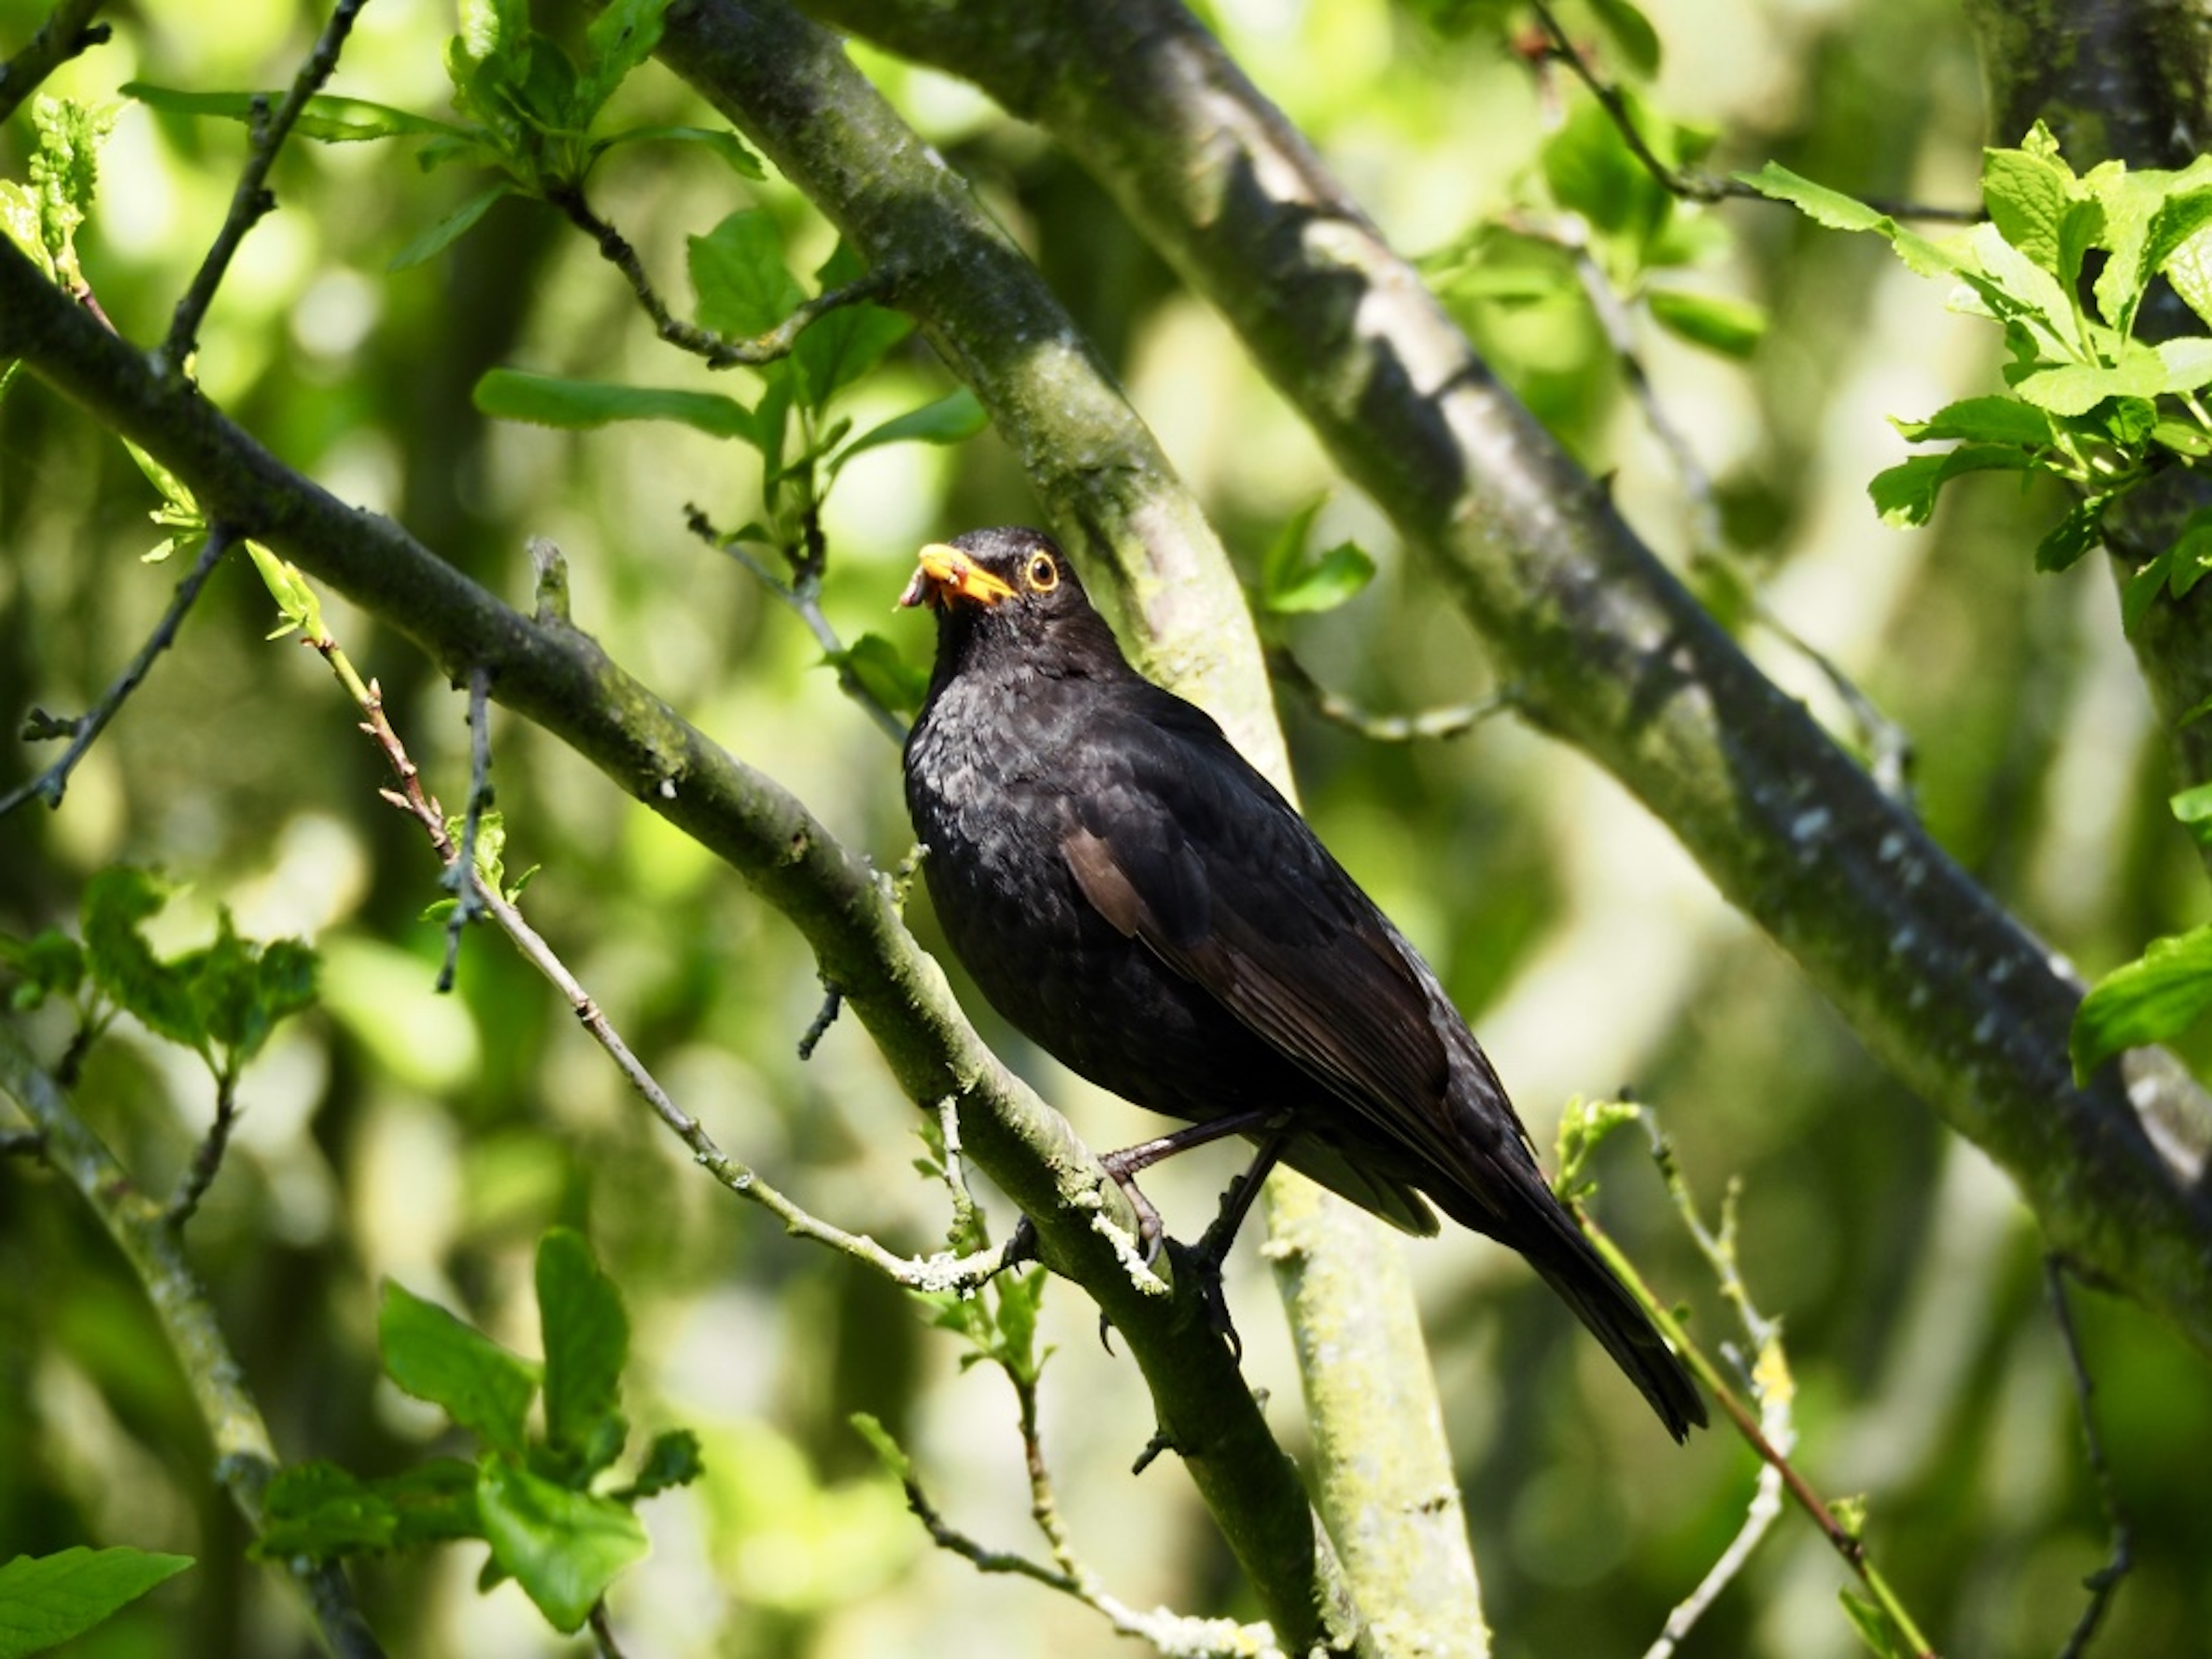 Blackbird by Maria Nunzia _Varvera